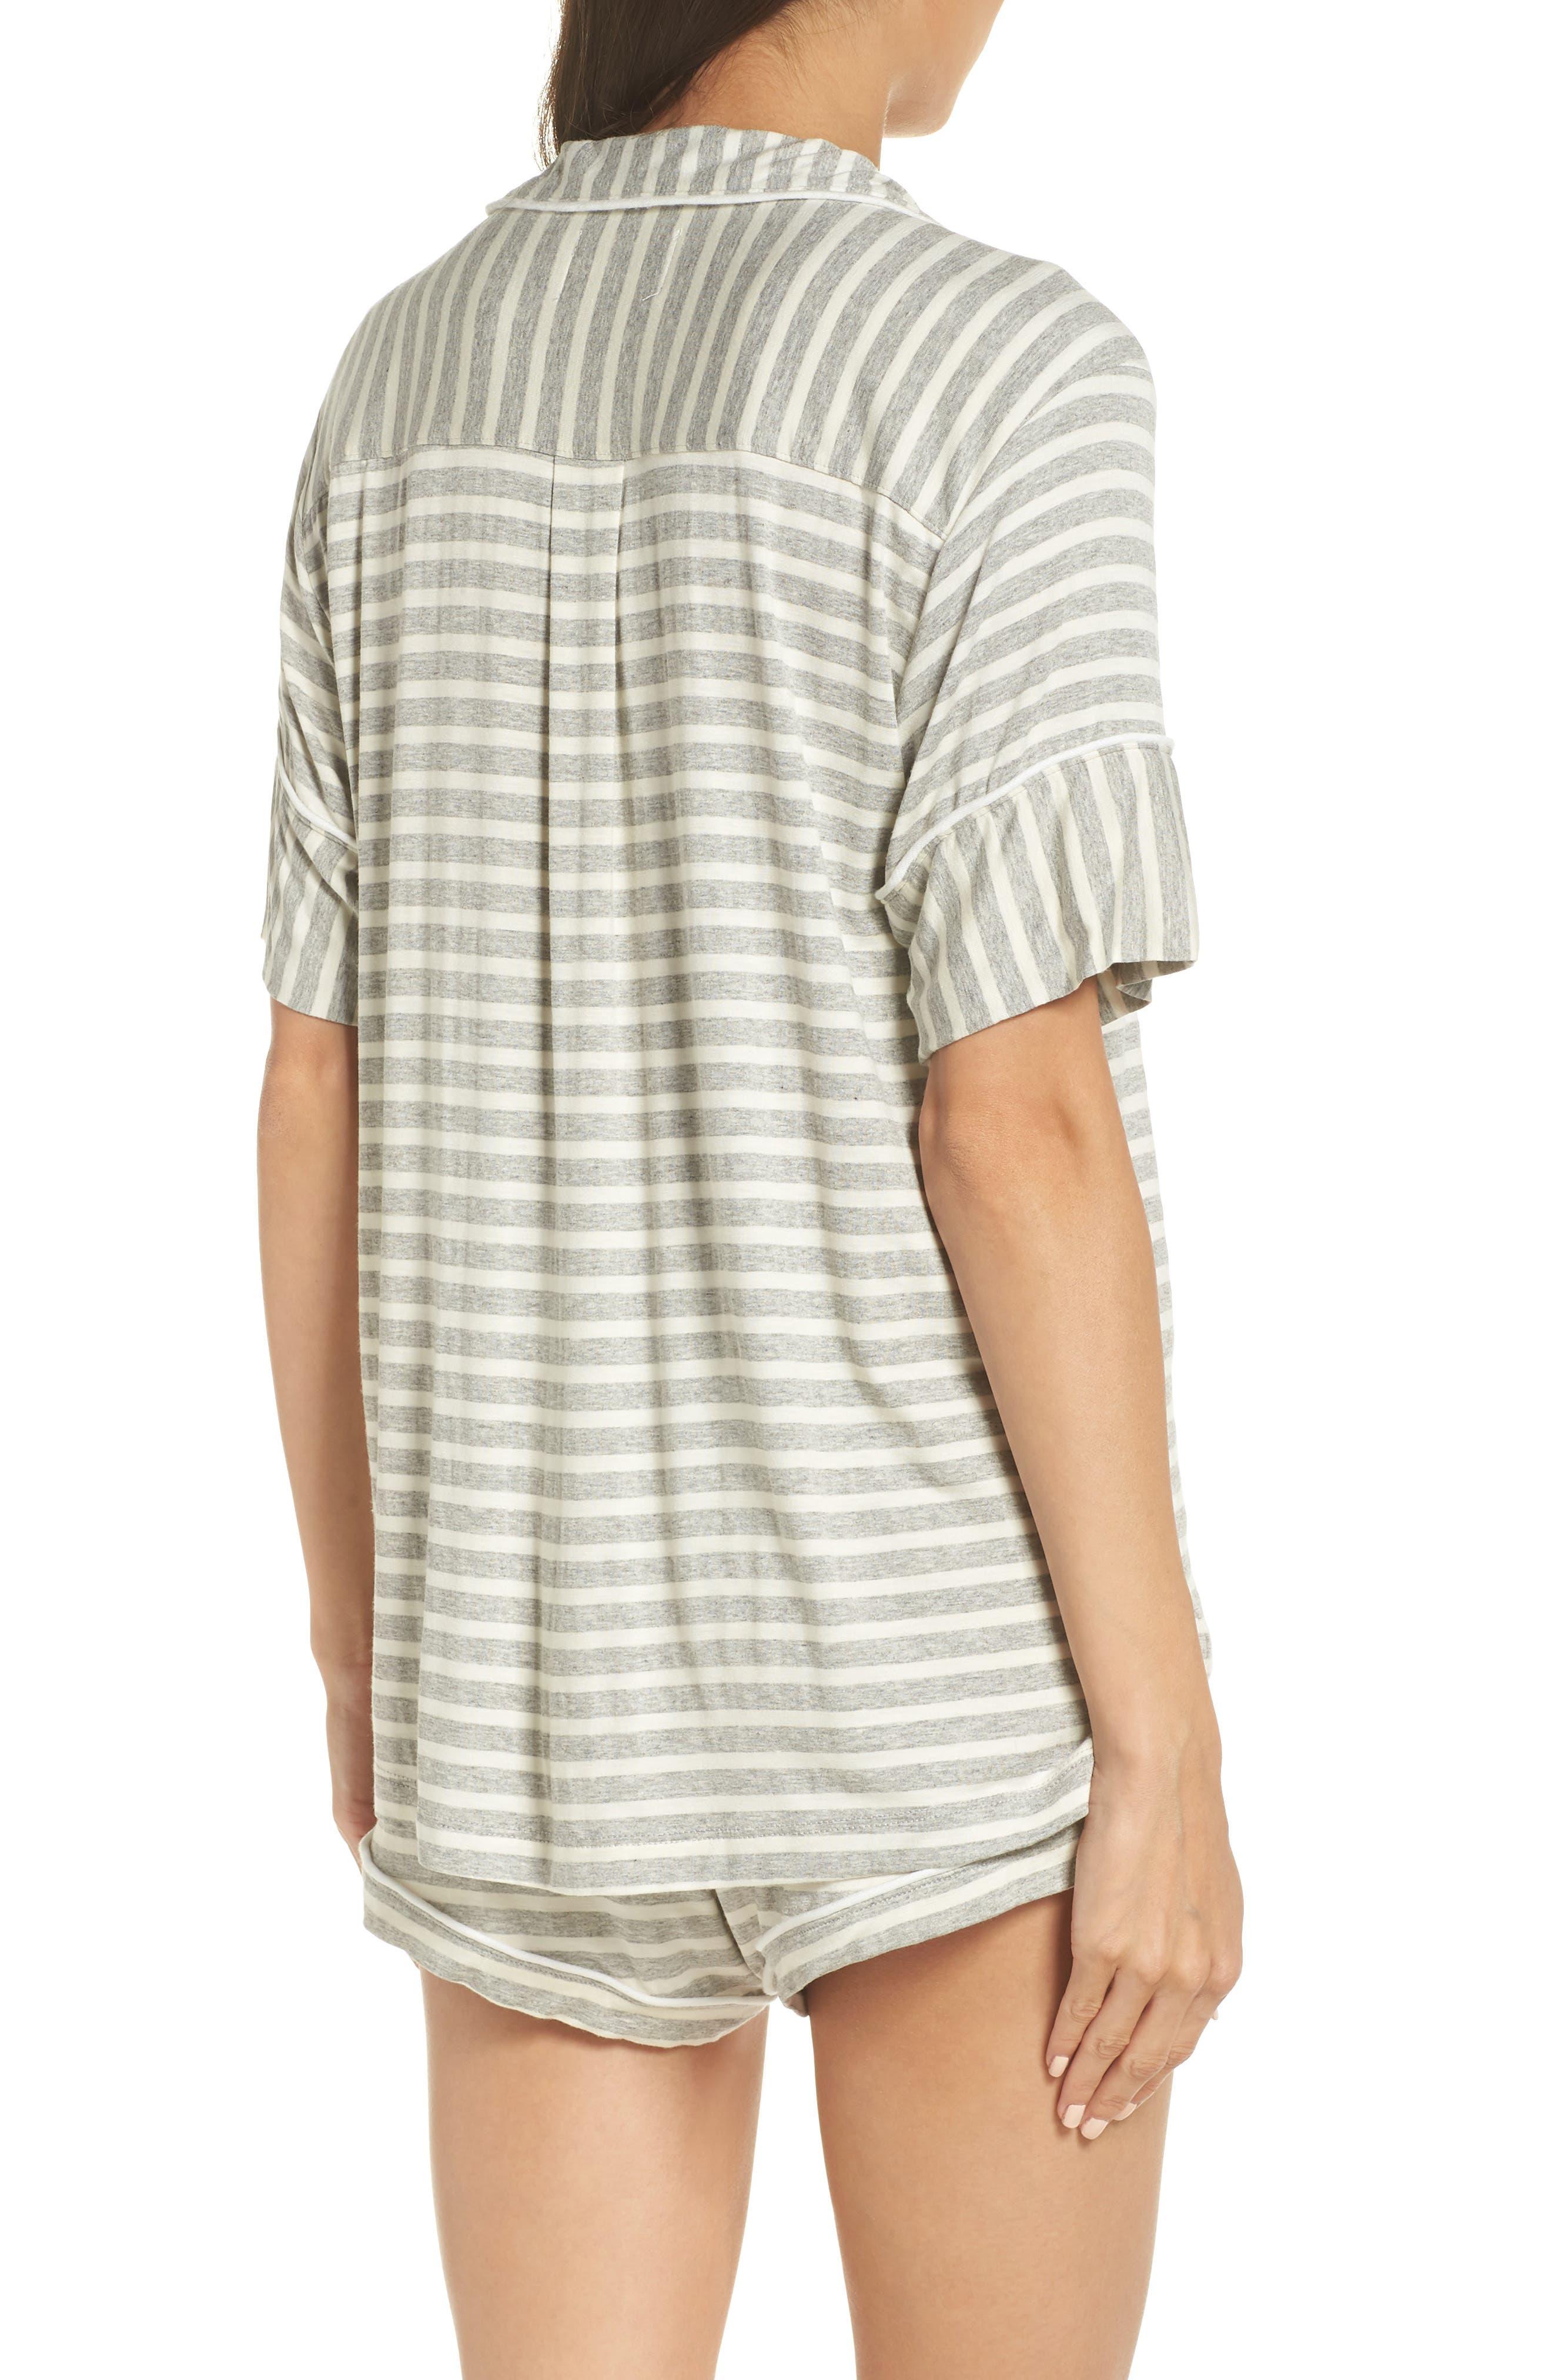 Monaco Short Pajamas,                             Alternate thumbnail 2, color,                             GREY STRIPE